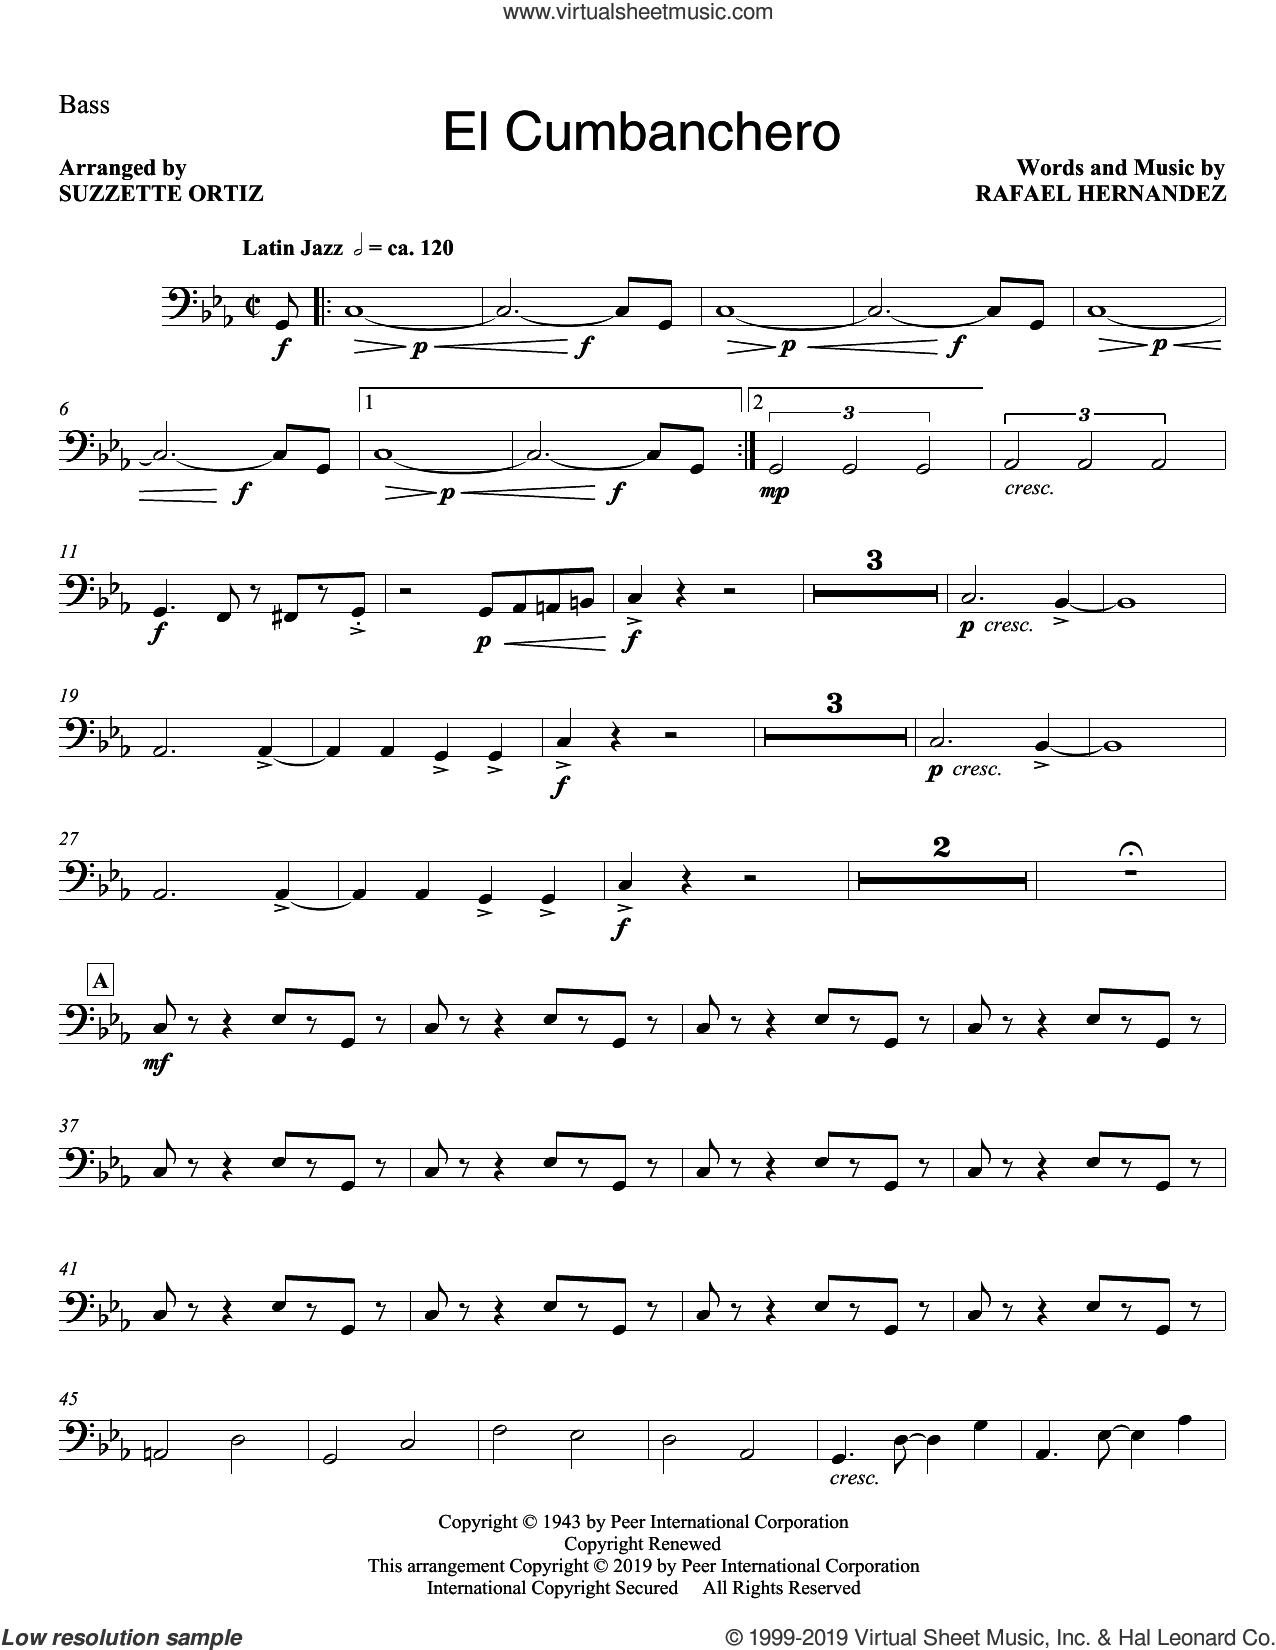 El Cumbanchero (arr. Suzette Ortiz) (complete set of parts) sheet music for orchestra/band by Rafael Hernandez, intermediate skill level